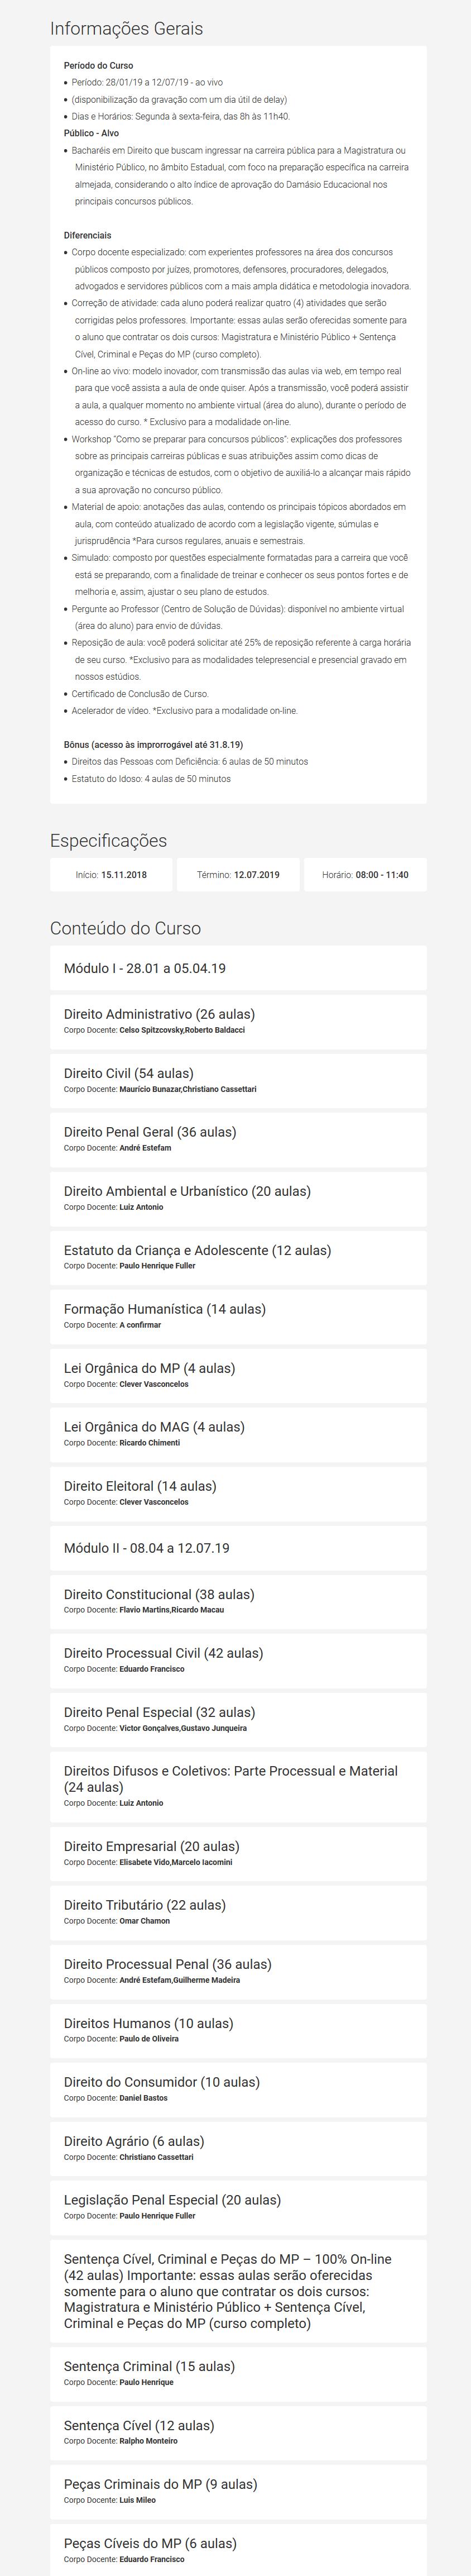 Magistratura_e_Ministério_Público_e_Teor